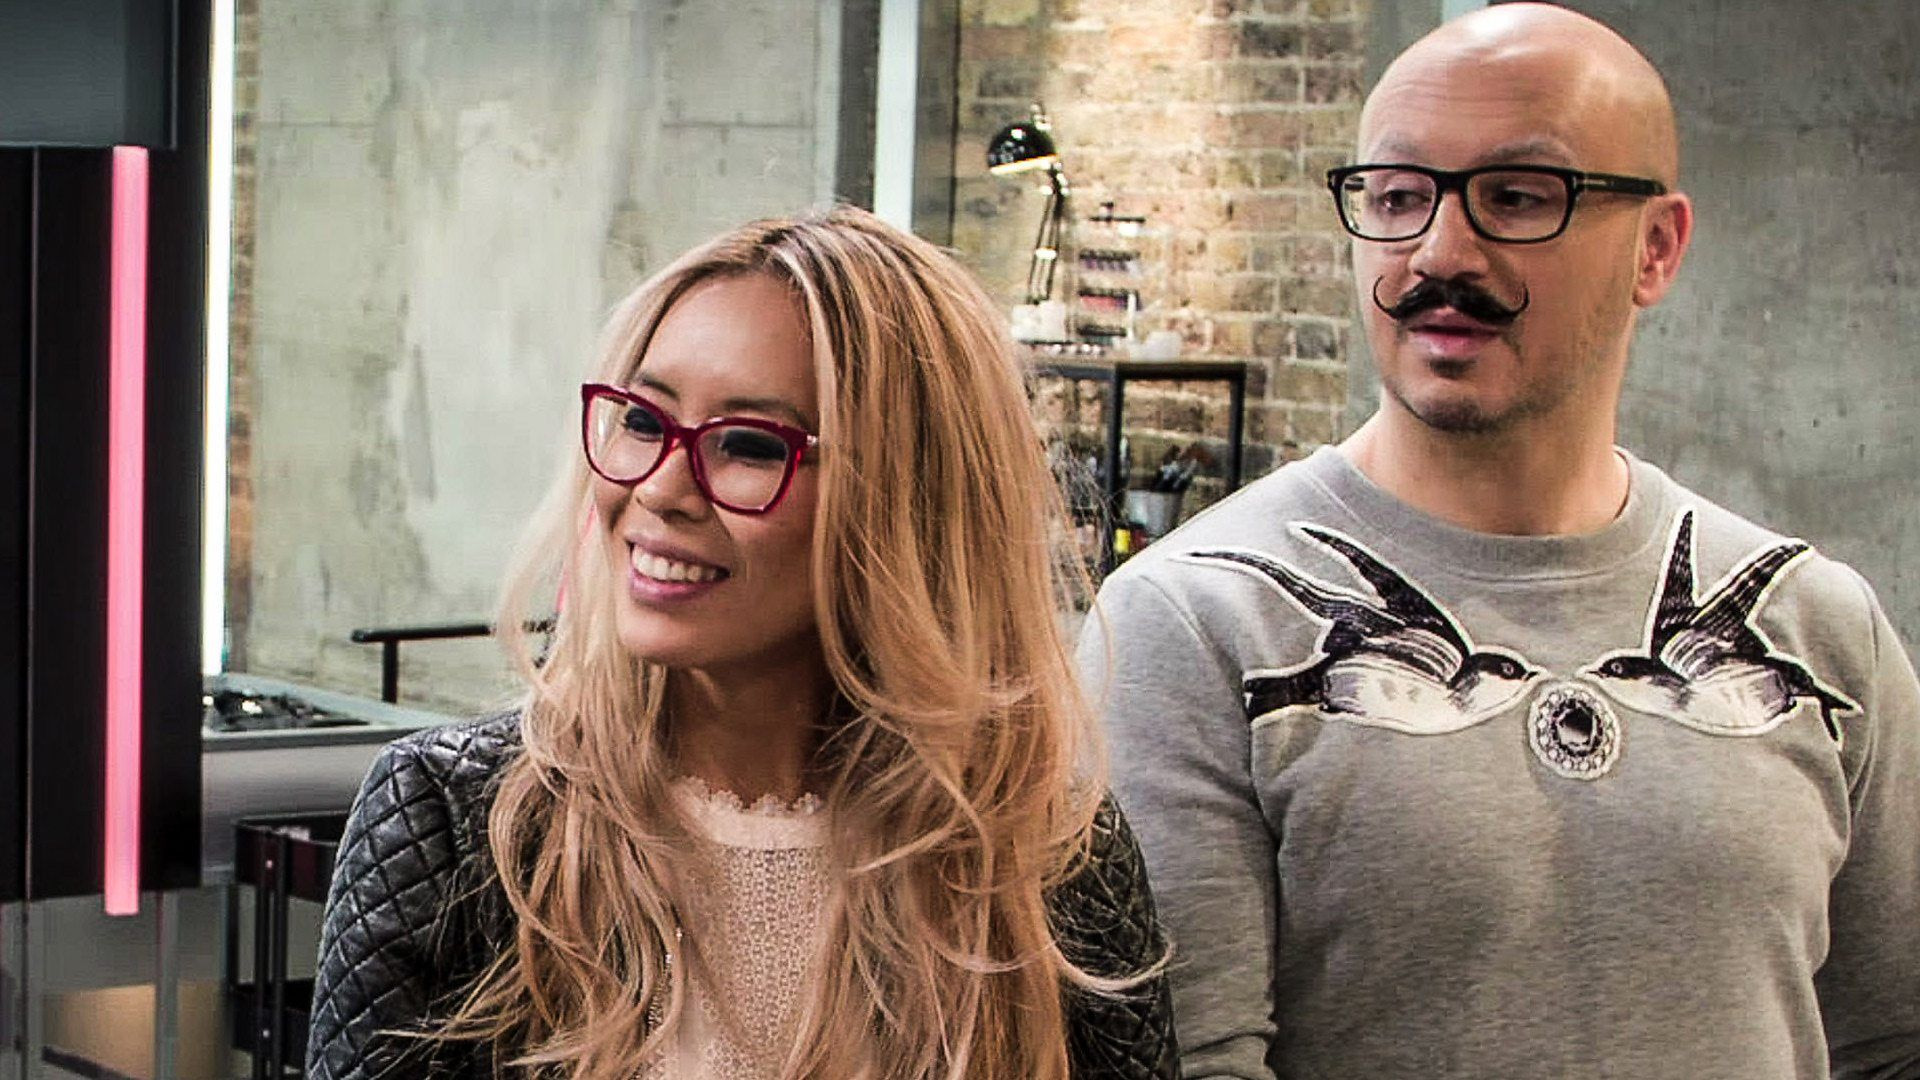 Glow Up: Britain's Next Make-Up Star — s01e06 — London Fashion Week